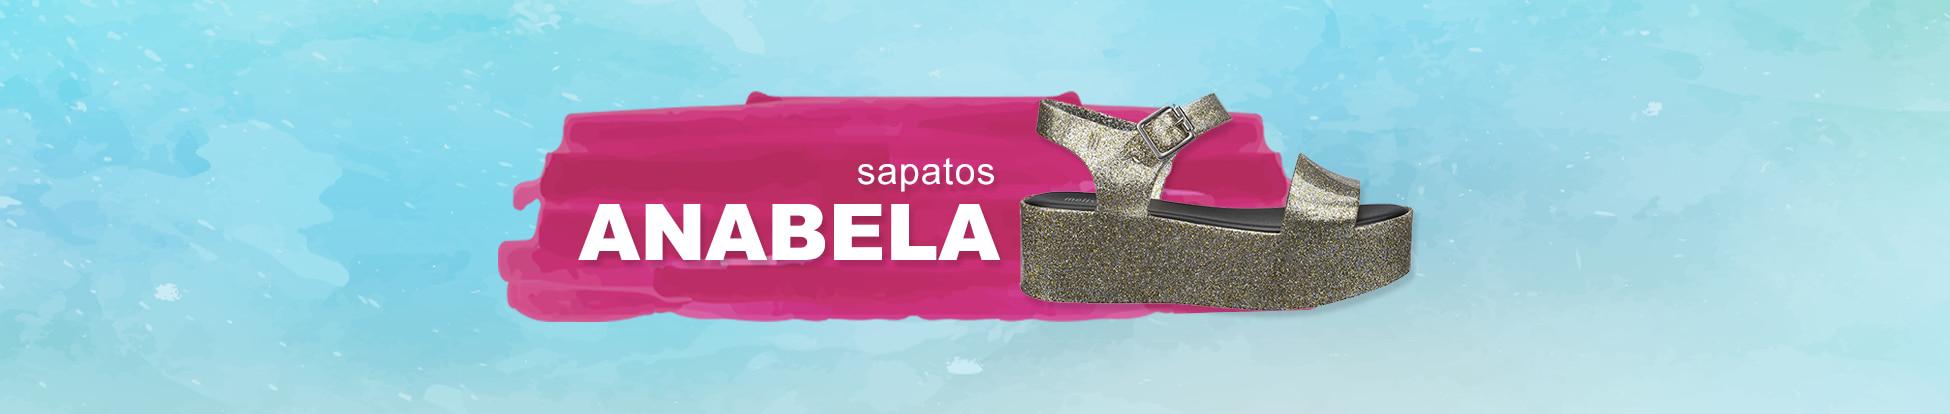 Sapatos - Anabela